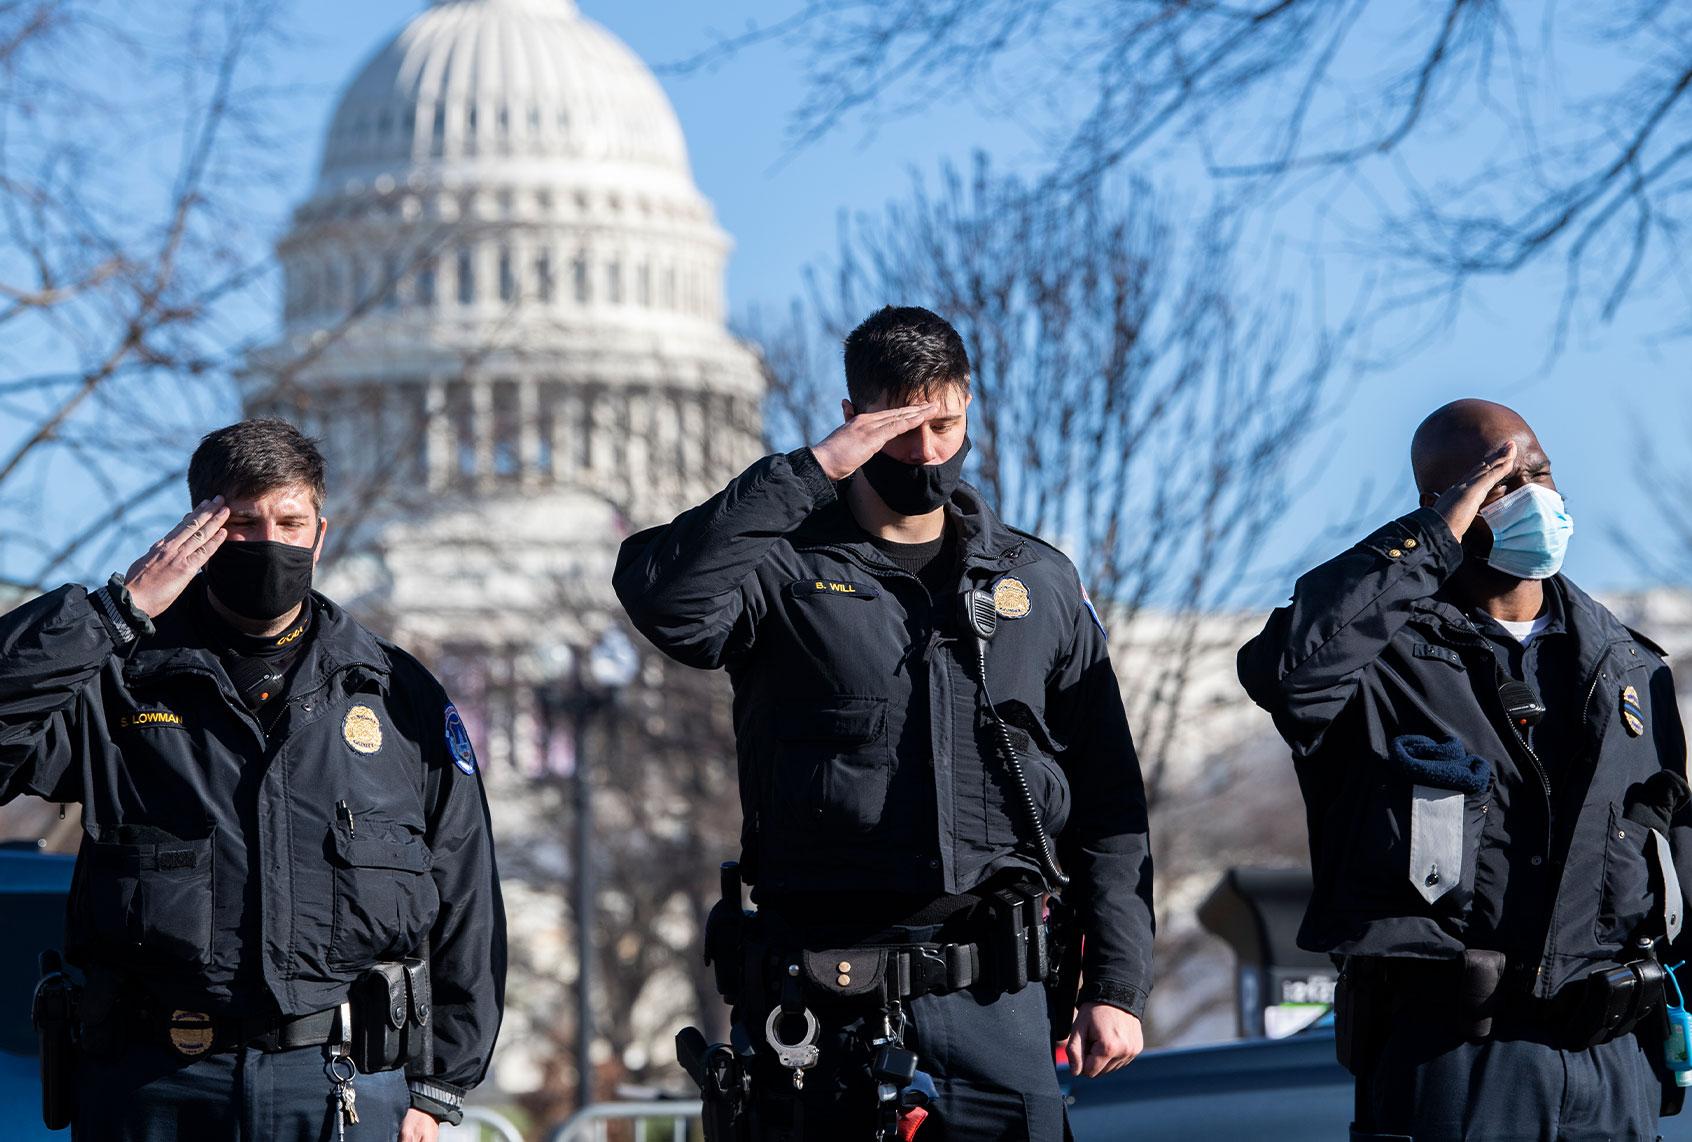 Officer Brian Sicknick was an Iraq vet who criticized Bush's war — and died  defending democracy | Salon.com